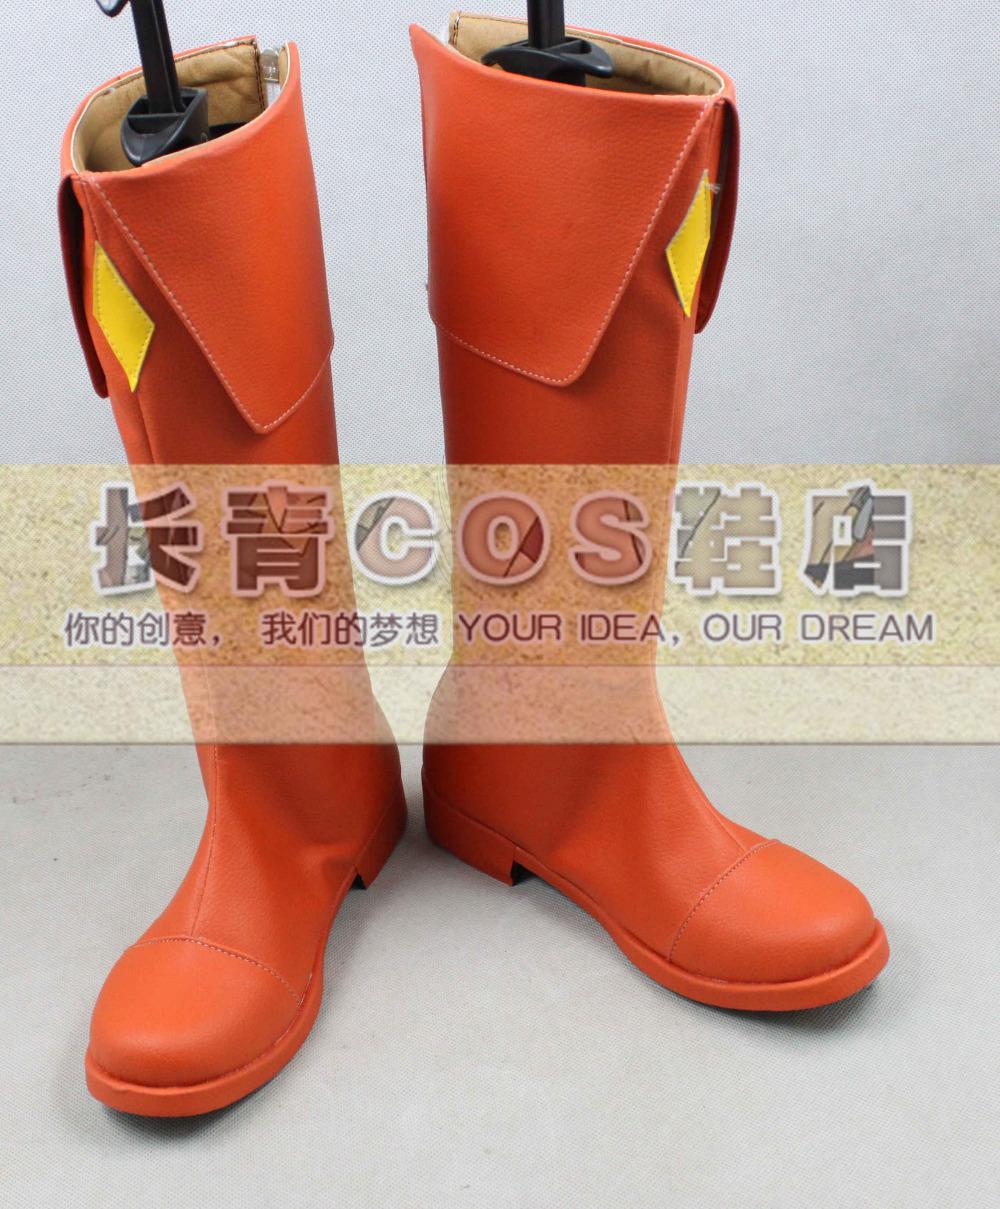 Find crossfit from a vast selection of одежда для